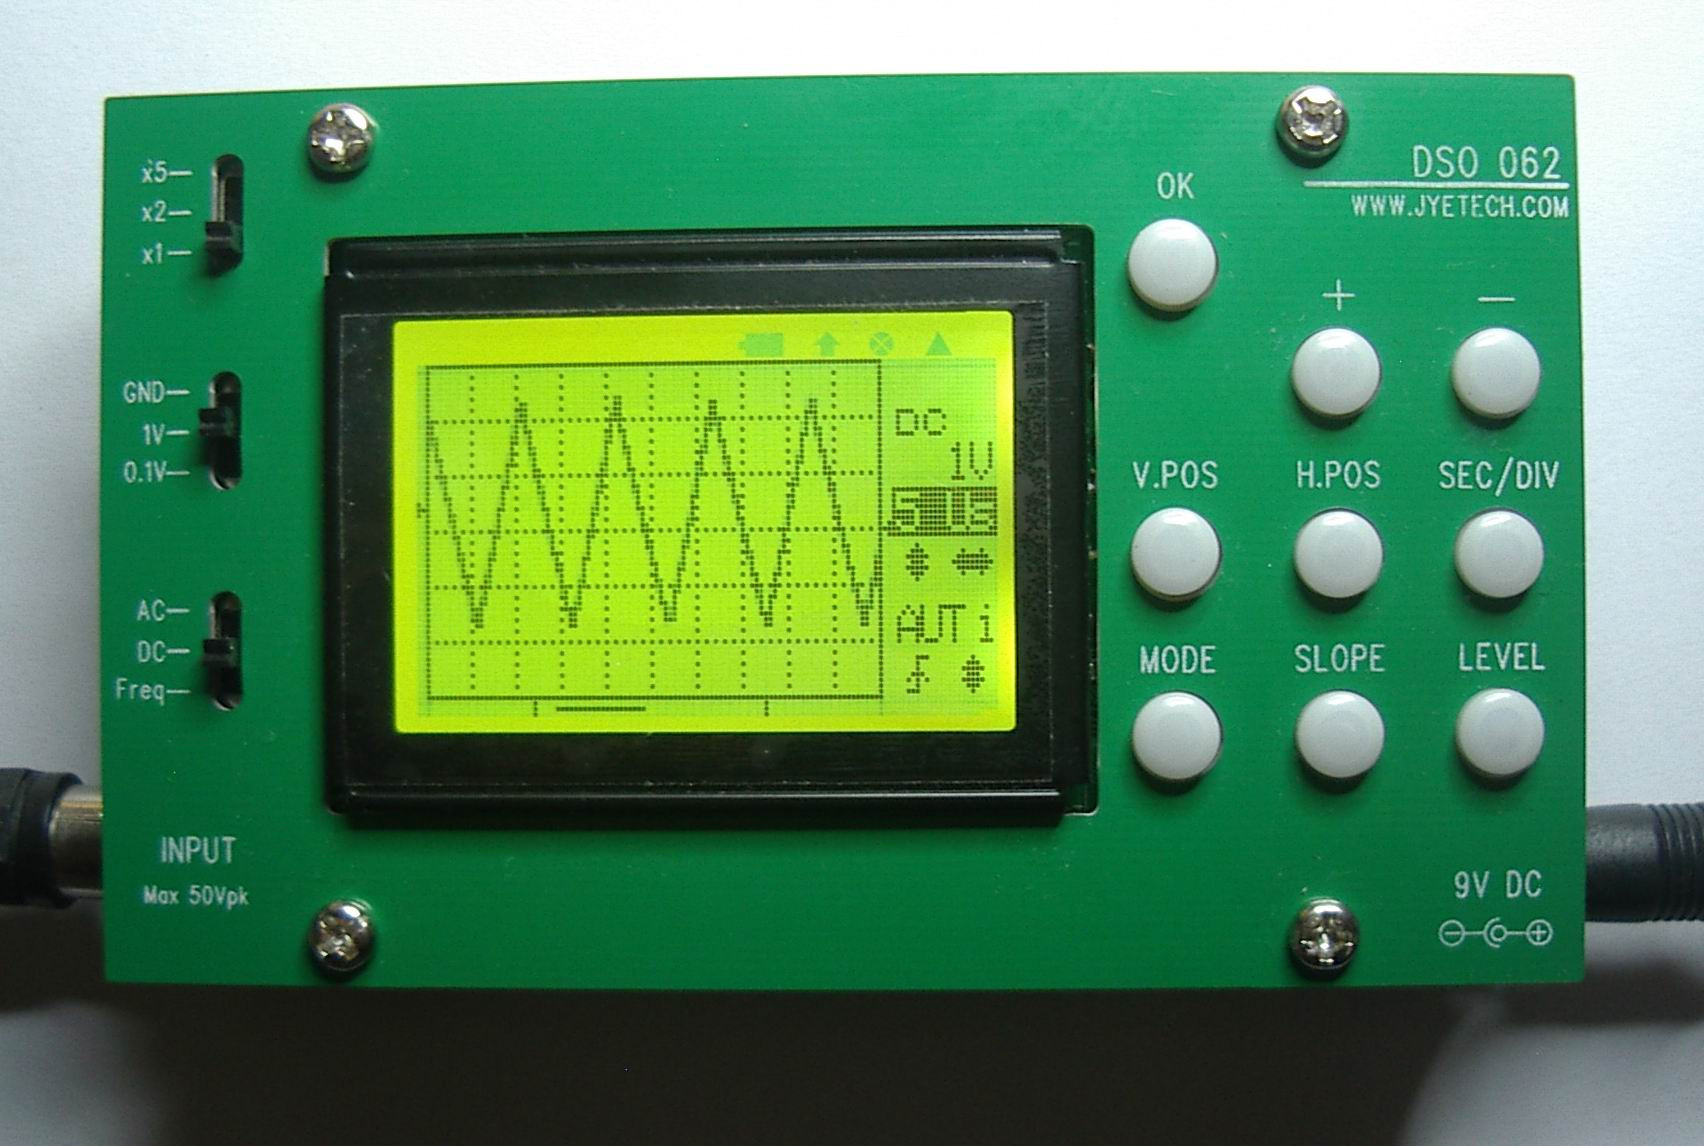 Diy Oscilloscope  JYE Tech DIY Oscilloscopes DIY Kits for Hobbyists